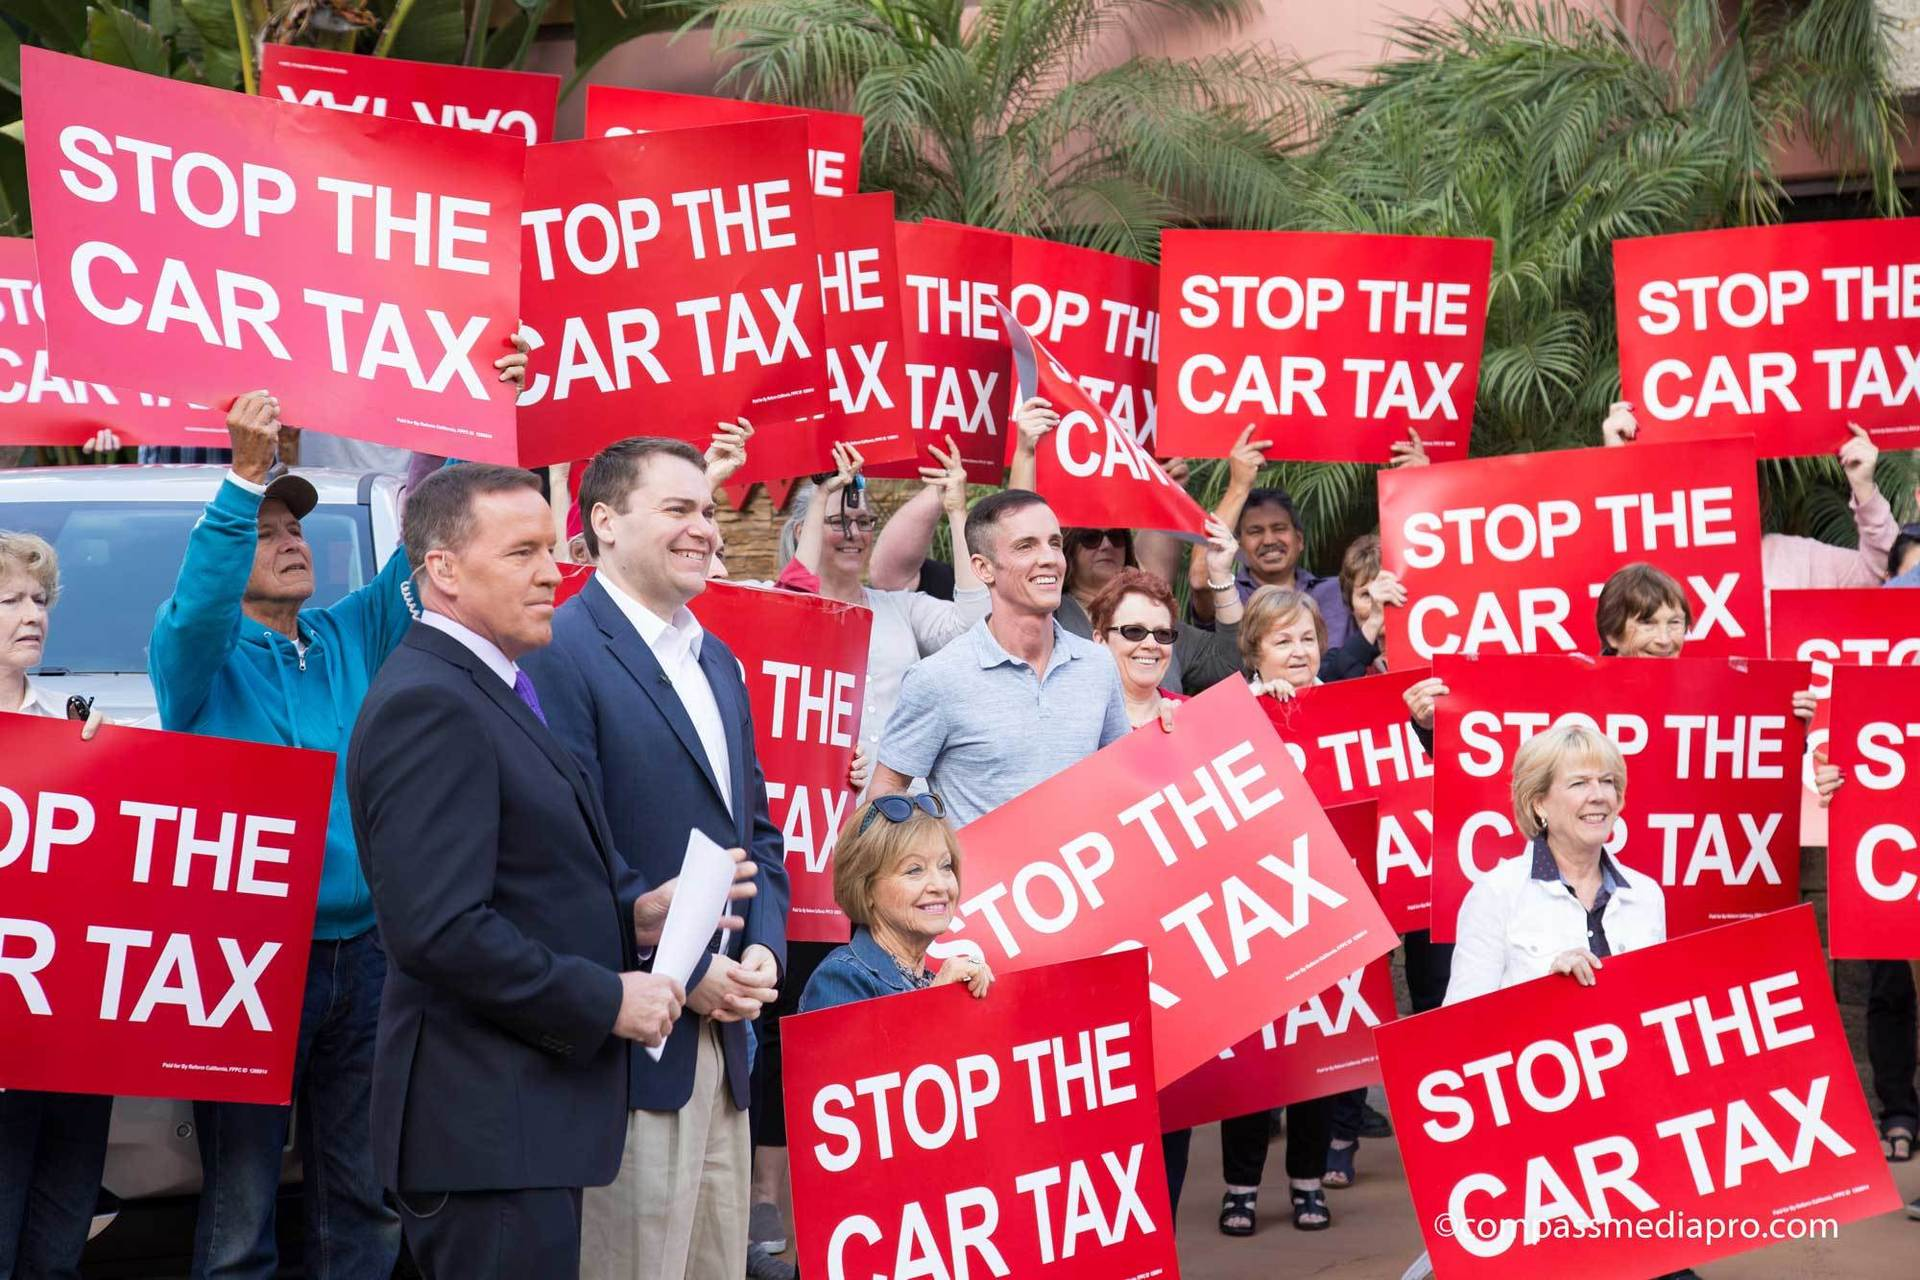 Carl stop car tax r